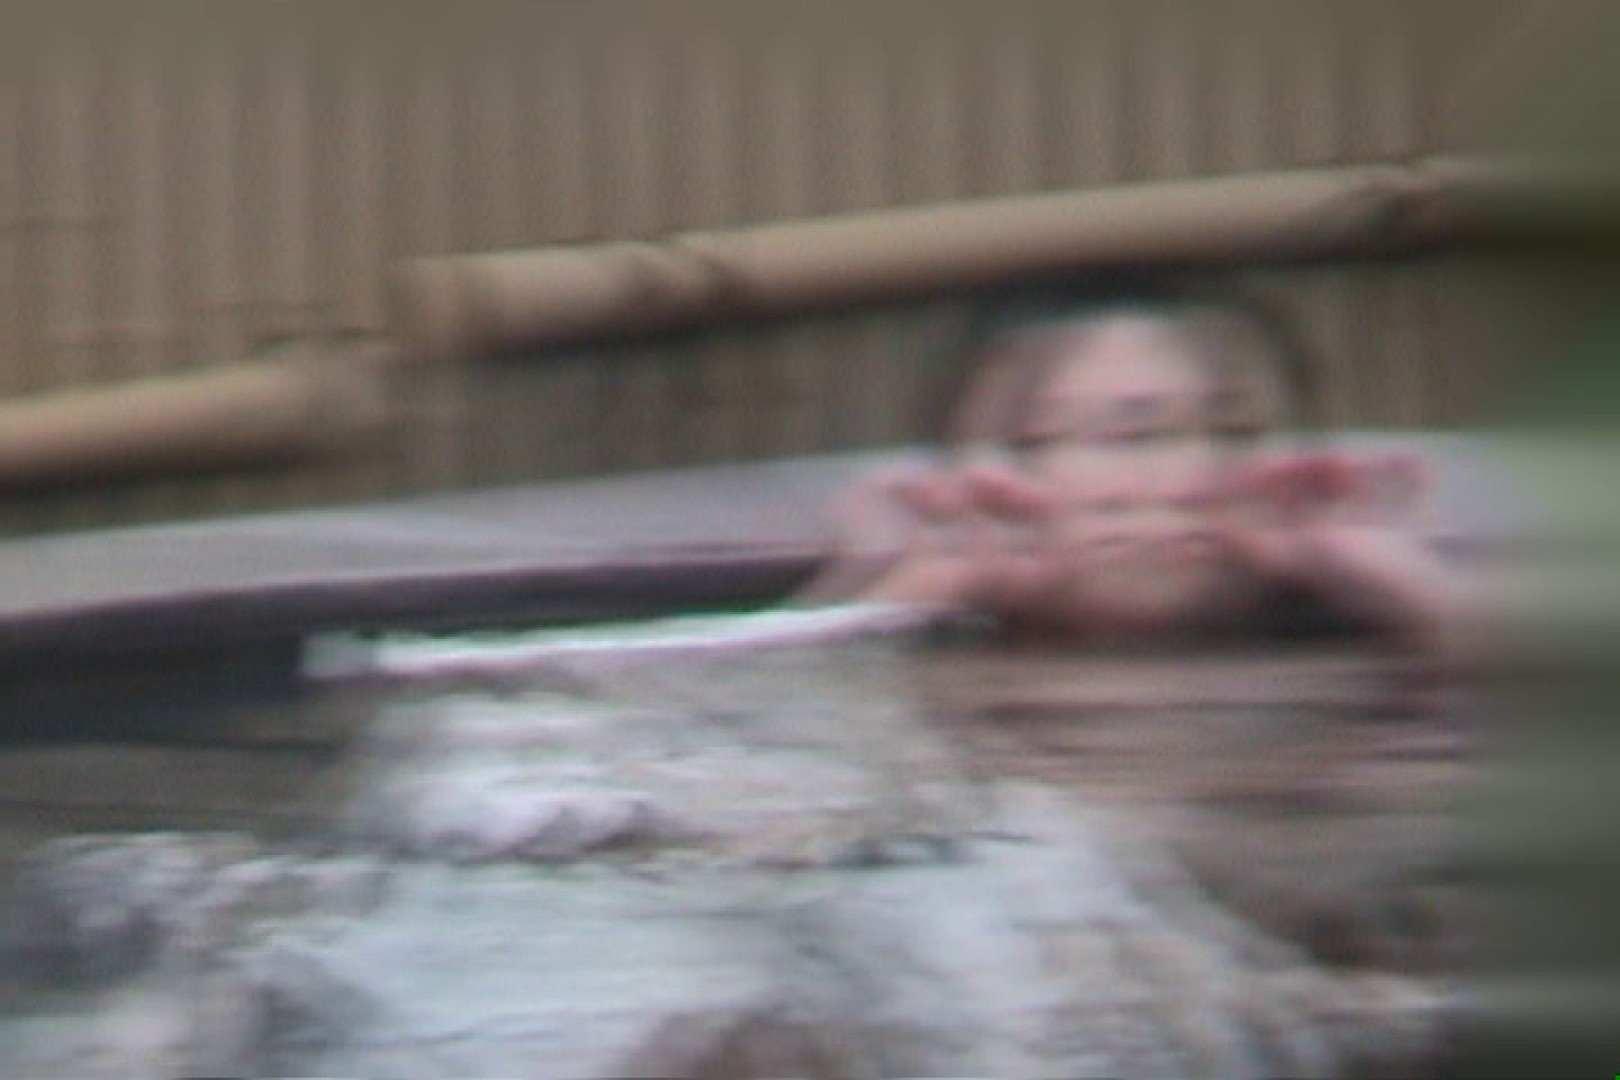 Aquaな露天風呂Vol.601 露天 | HなOL  48pic 1